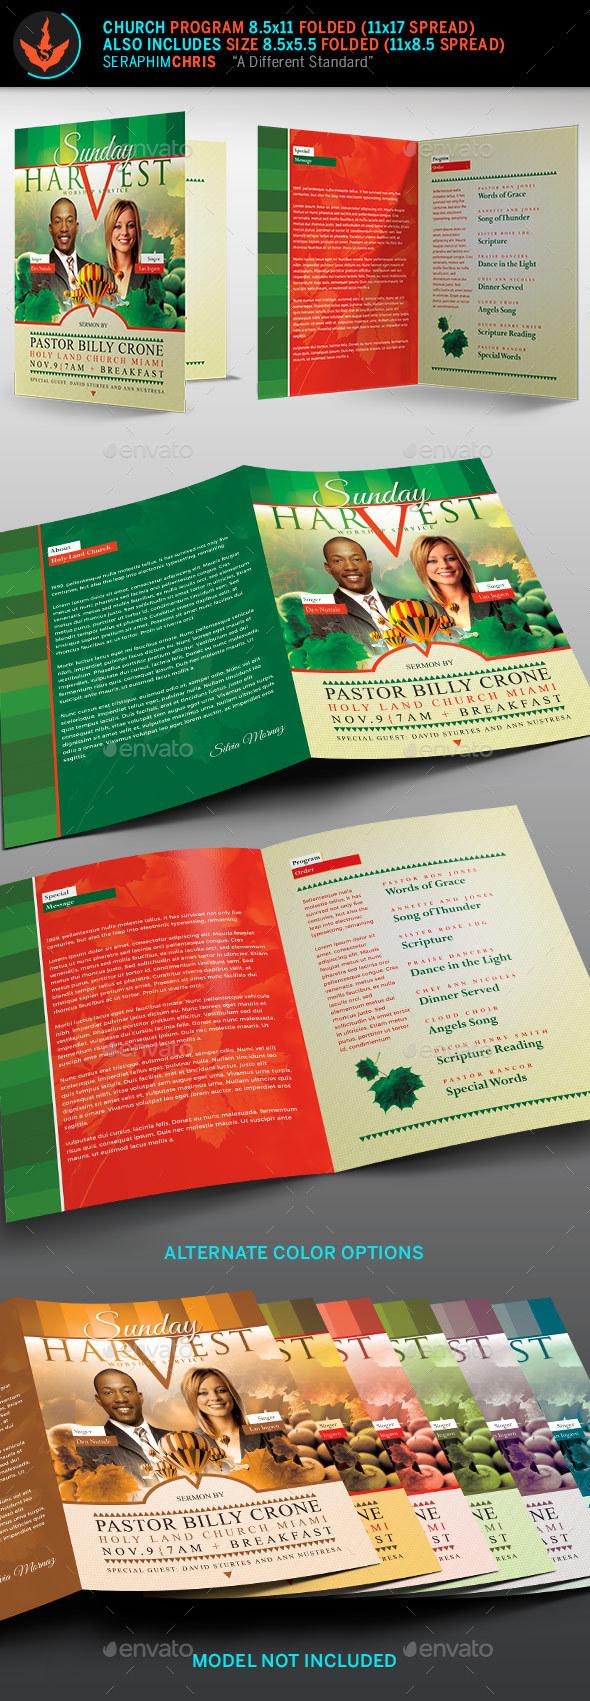 Sunday Harvest Church Program Template - Informational Brochures